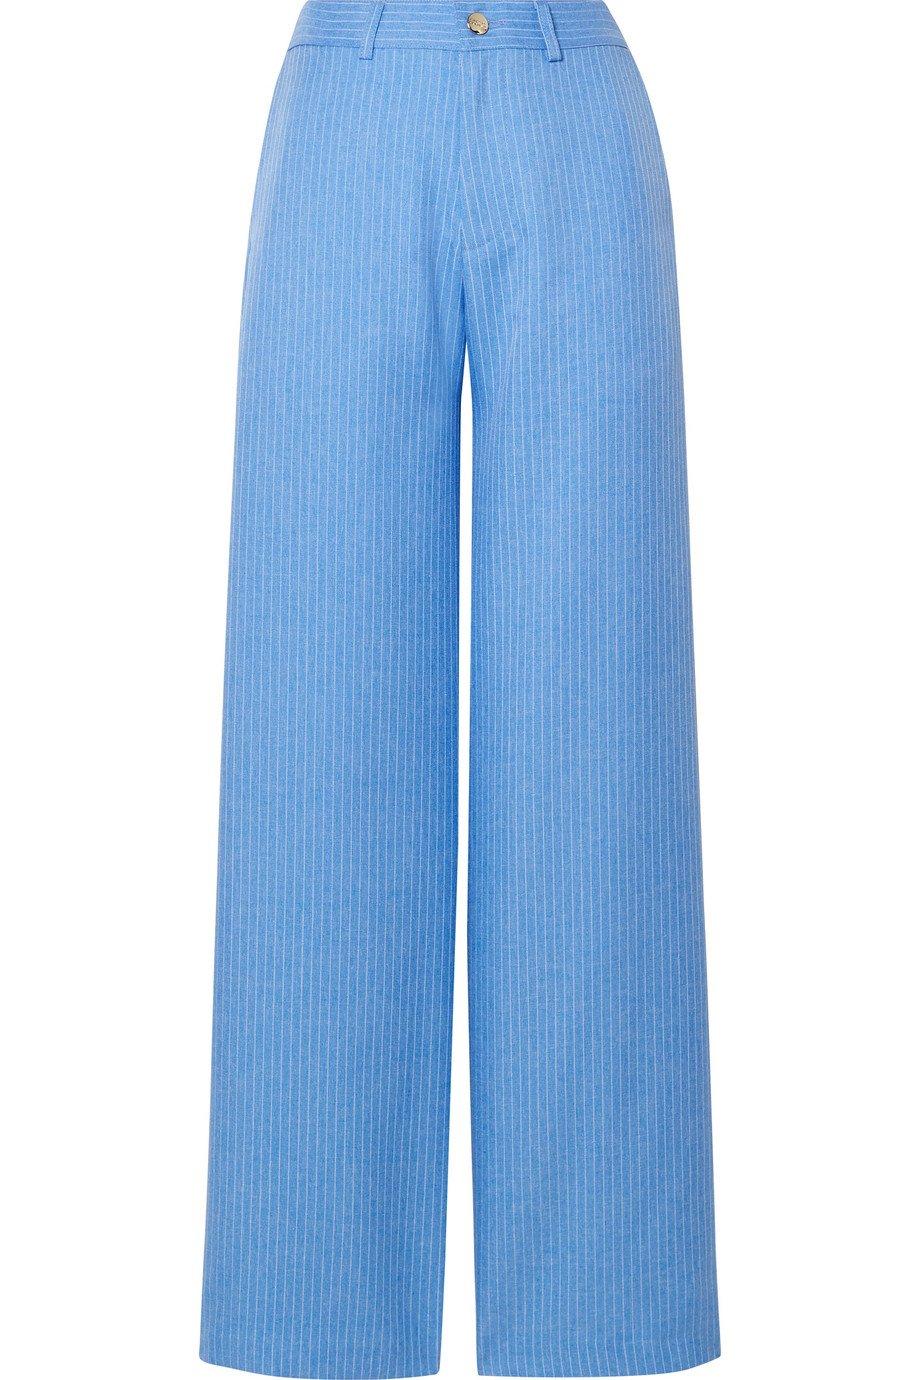 Maggie Marilyn | + NET SUSTAIN Go Getter pinstriped woven straight-leg pants | NET-A-PORTER.COM